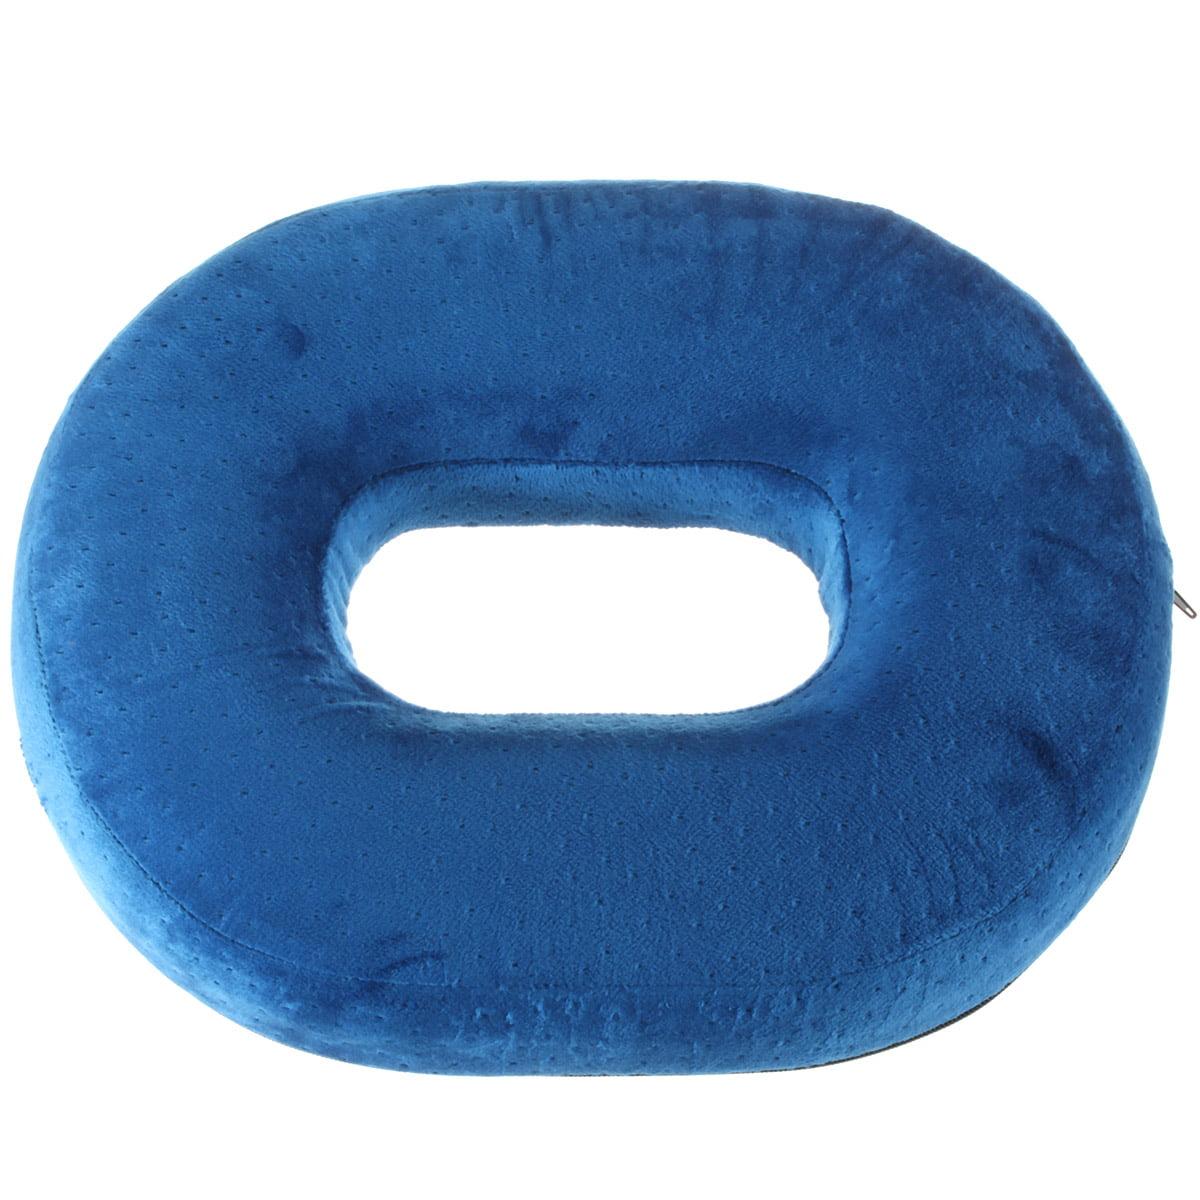 "16"" Memory Sponge Ring Soft Cushion Car Seat Donut Support Travel Pillow Pressure Pile Hemorrhoid Treatment, Bed Sores, Coccyx & Tailbone Pain, Prostatitis"